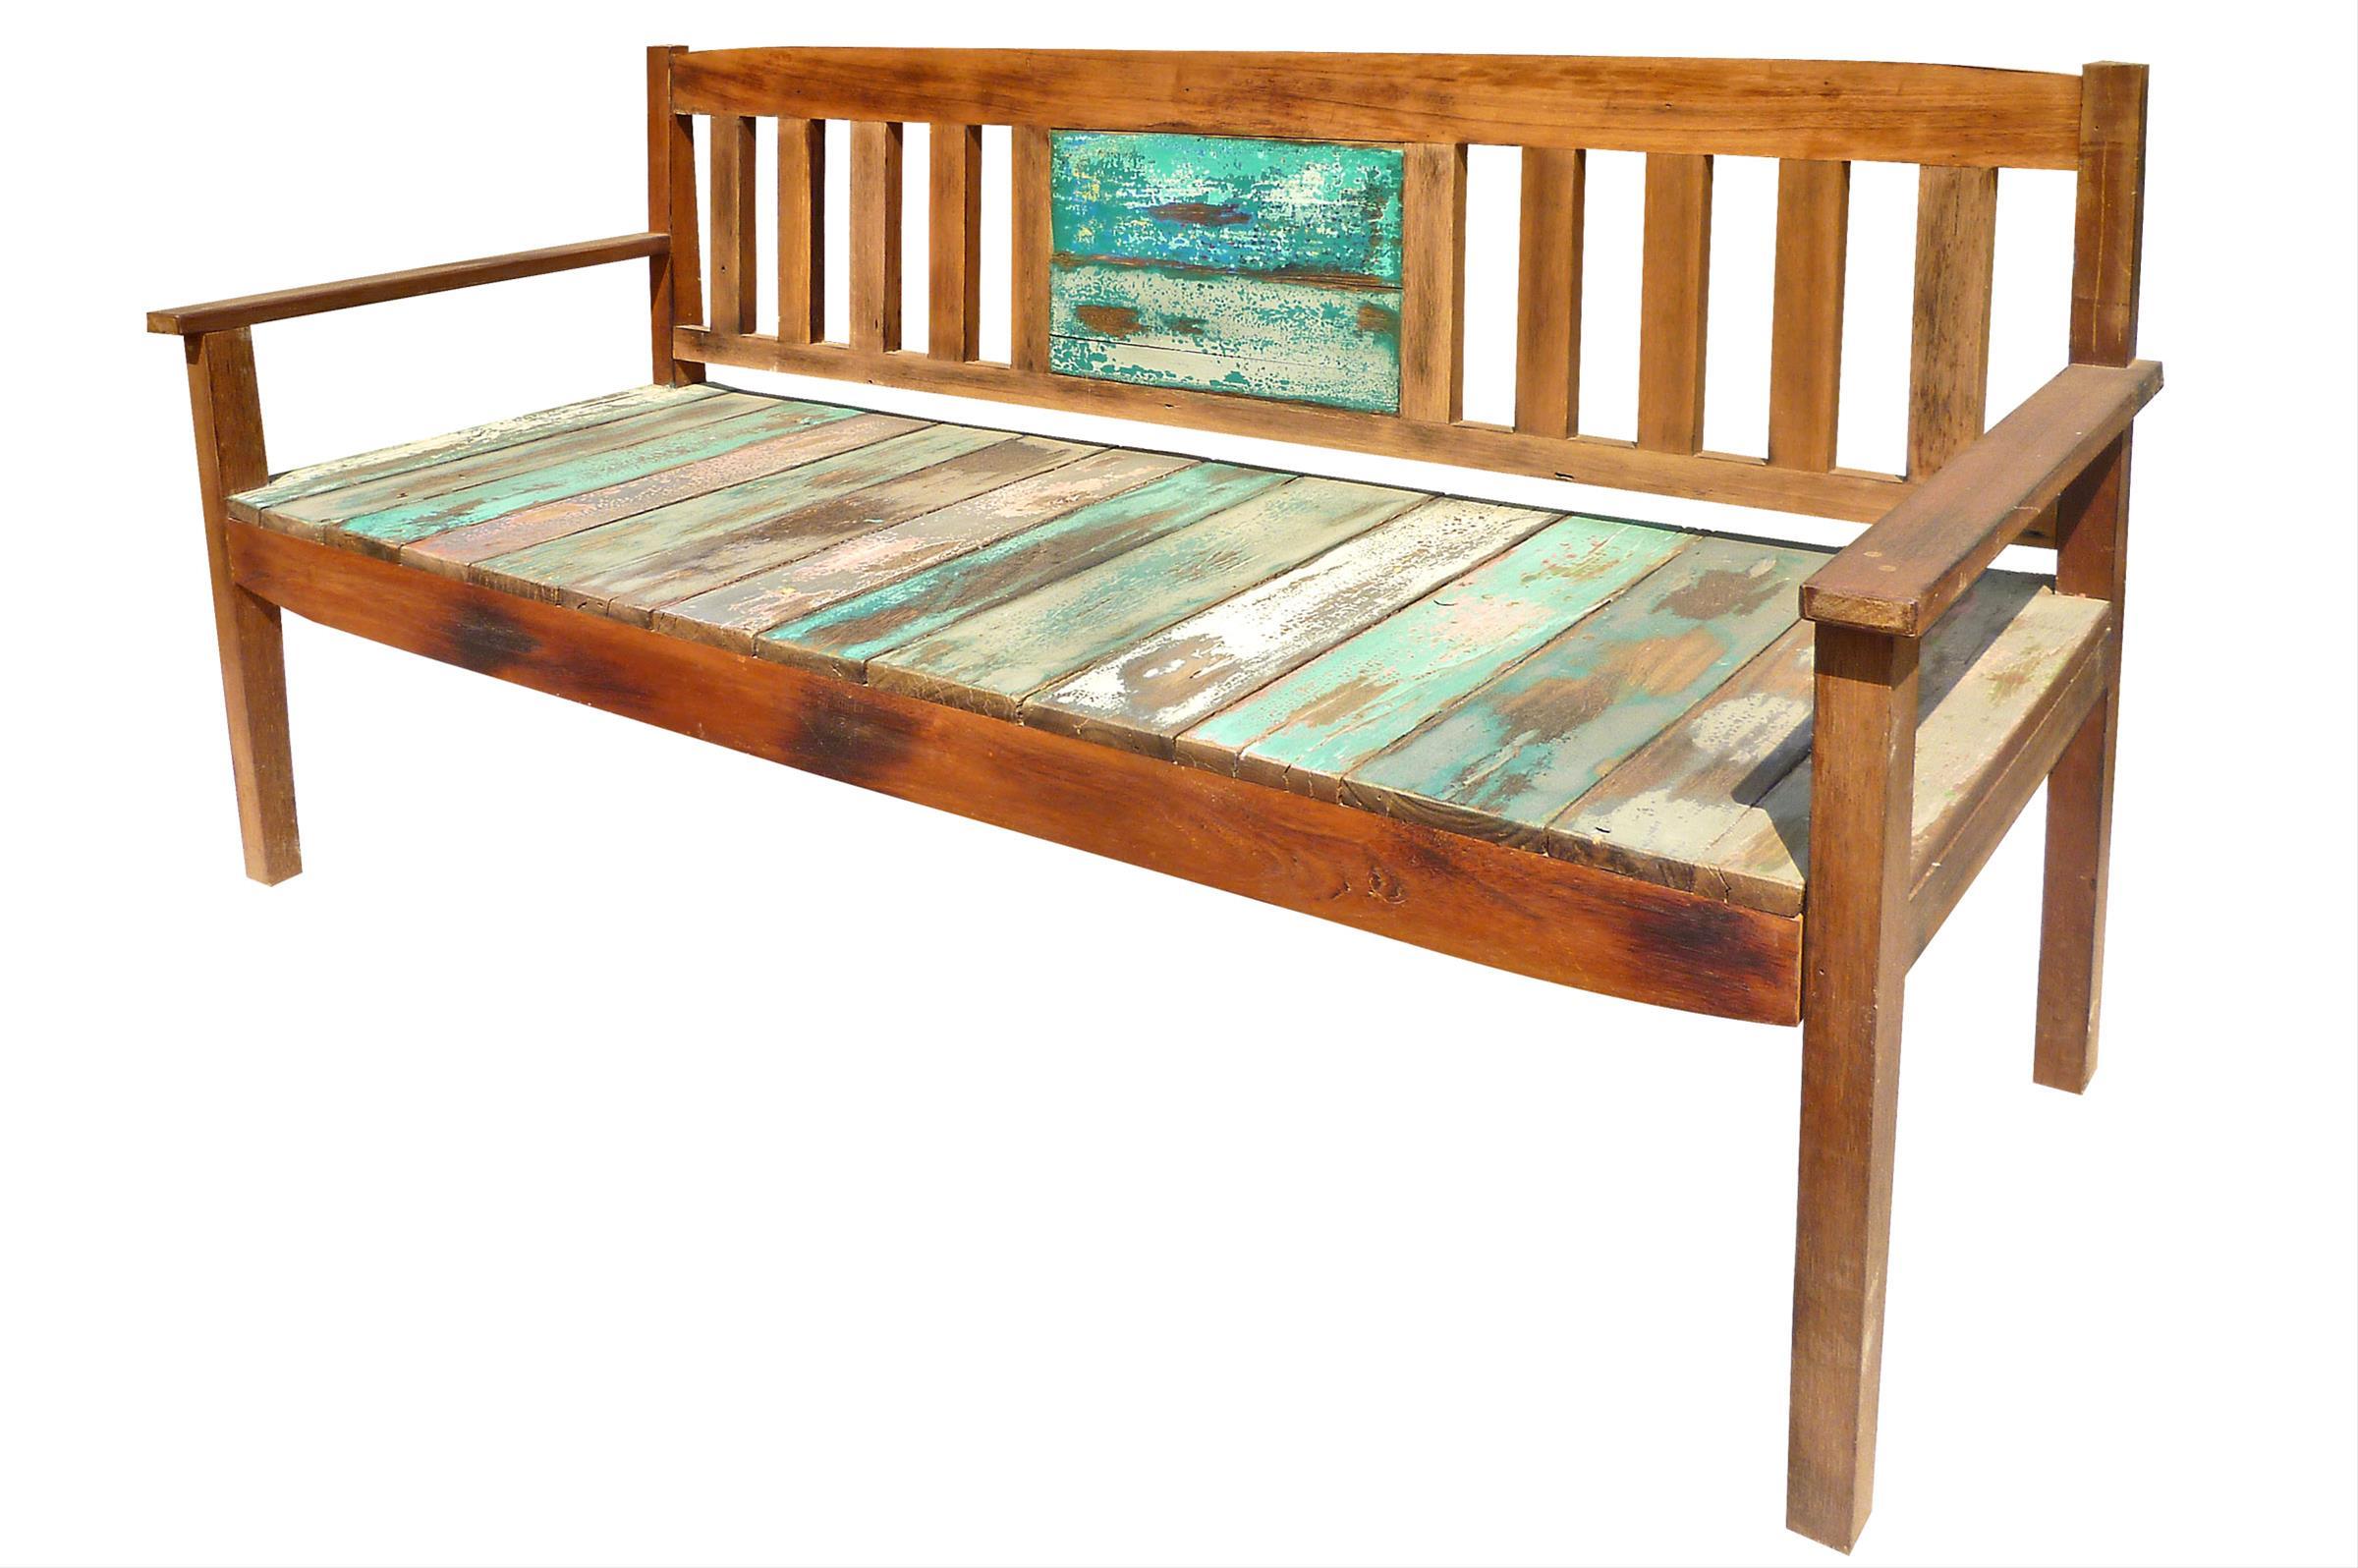 gartenbank 7106 3 sitzer aus recyceltem fischerbootholz. Black Bedroom Furniture Sets. Home Design Ideas